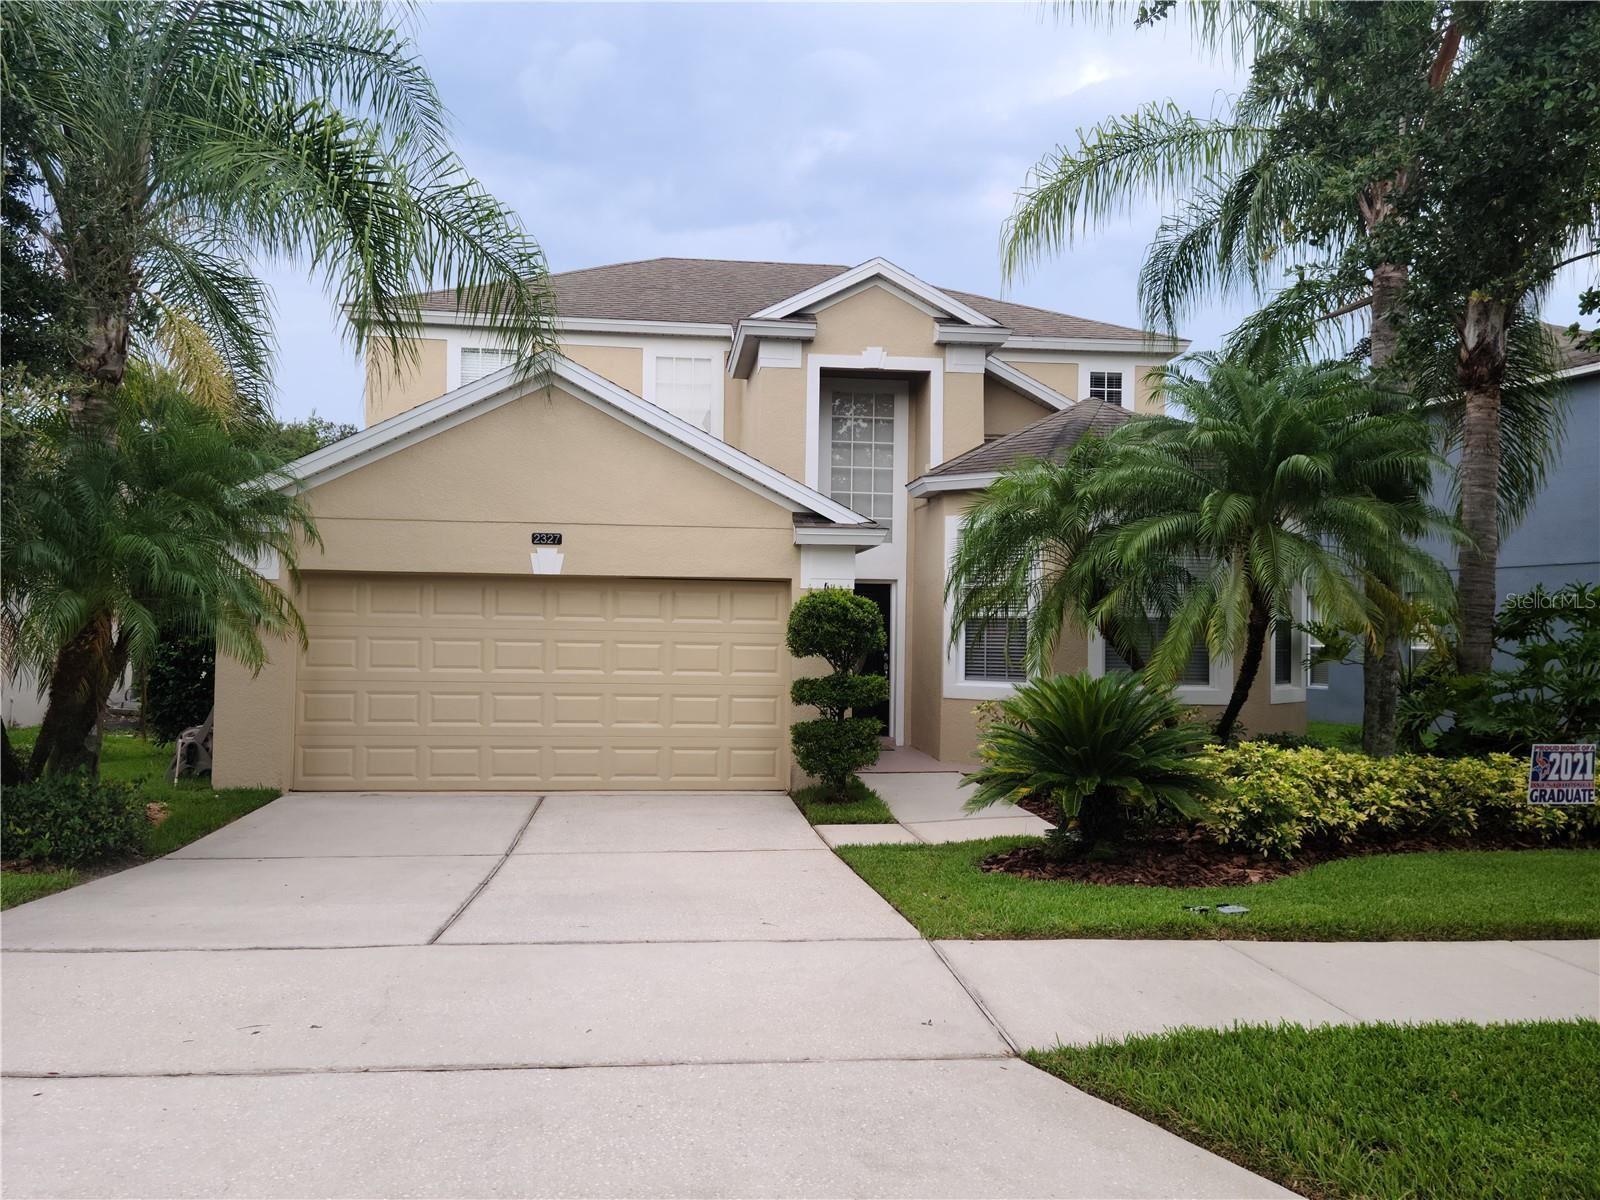 2327 BLACK LAKE BOULEVARD, Winter Garden, FL 34787 - #: O5960998